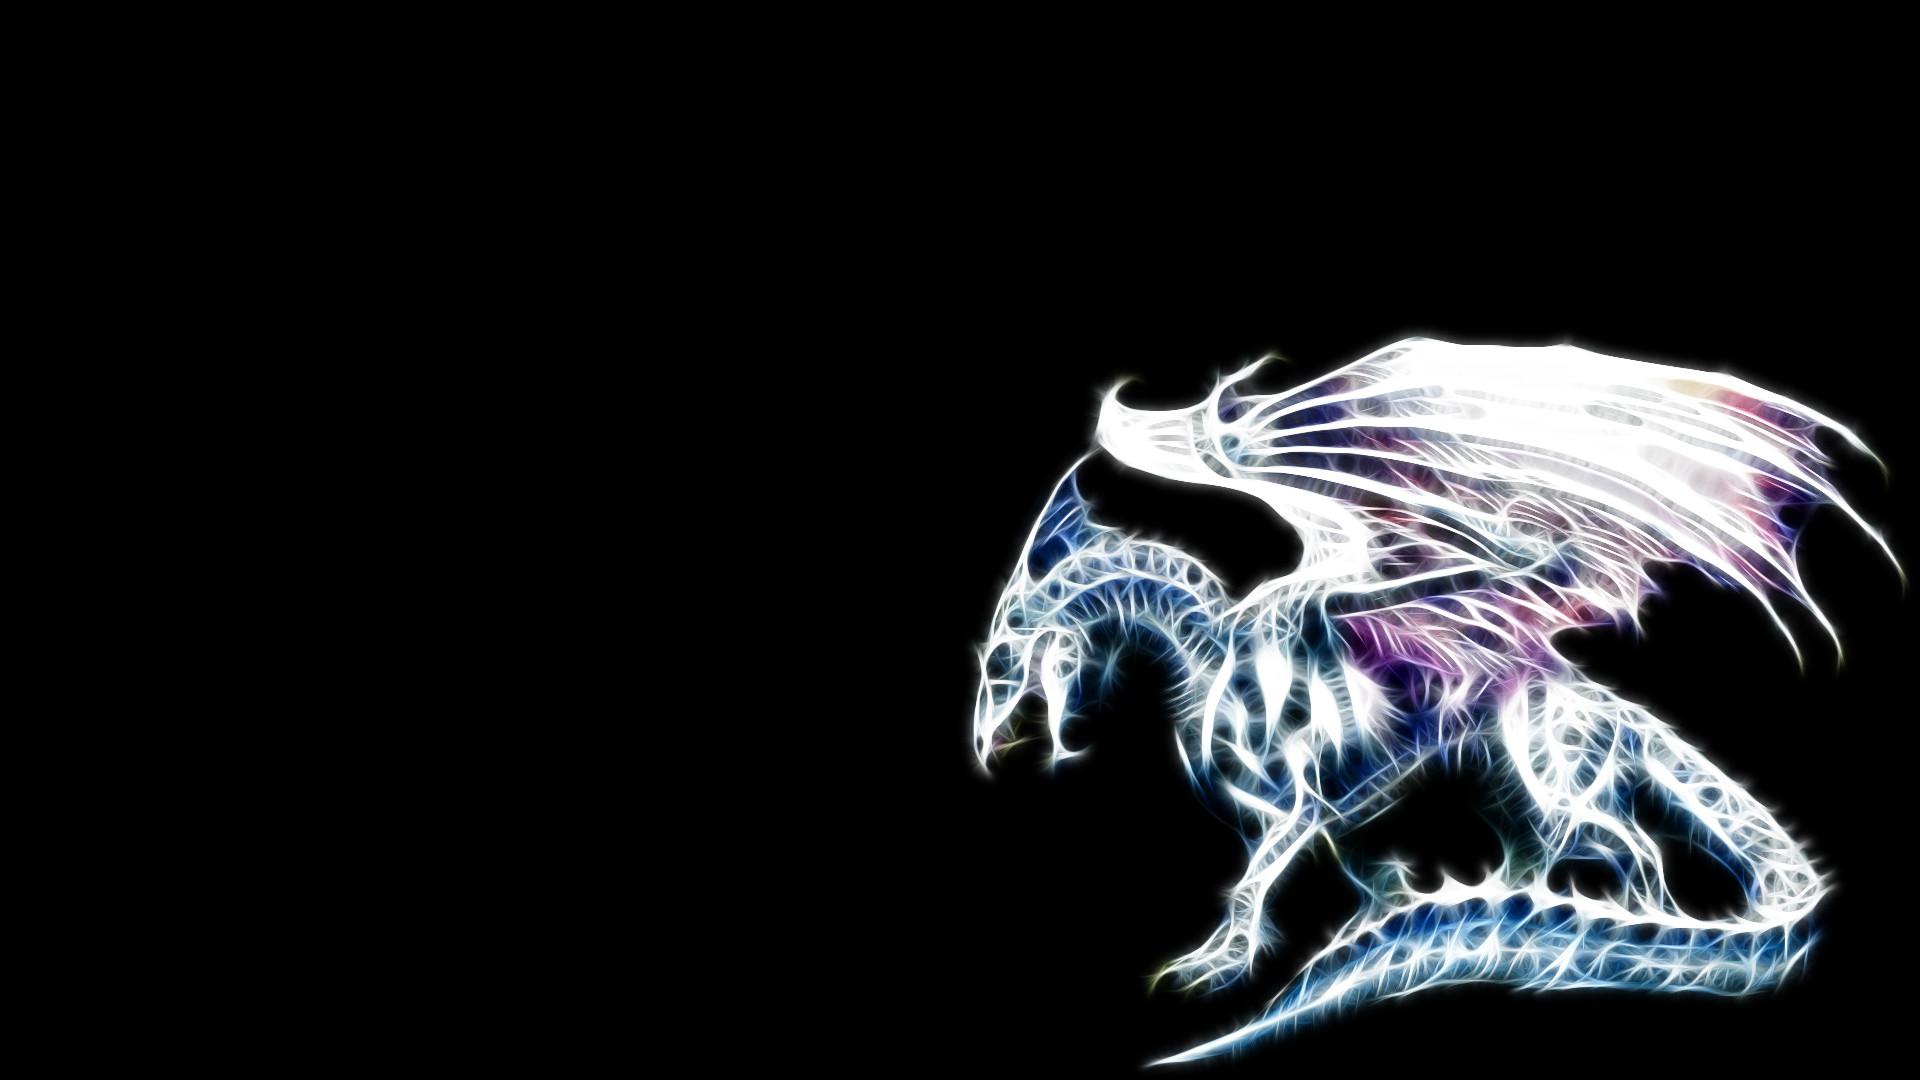 Full HD p Dragon Wallpapers HD, Desktop Backgrounds 1920×1080 Dragon Image  Wallpapers (